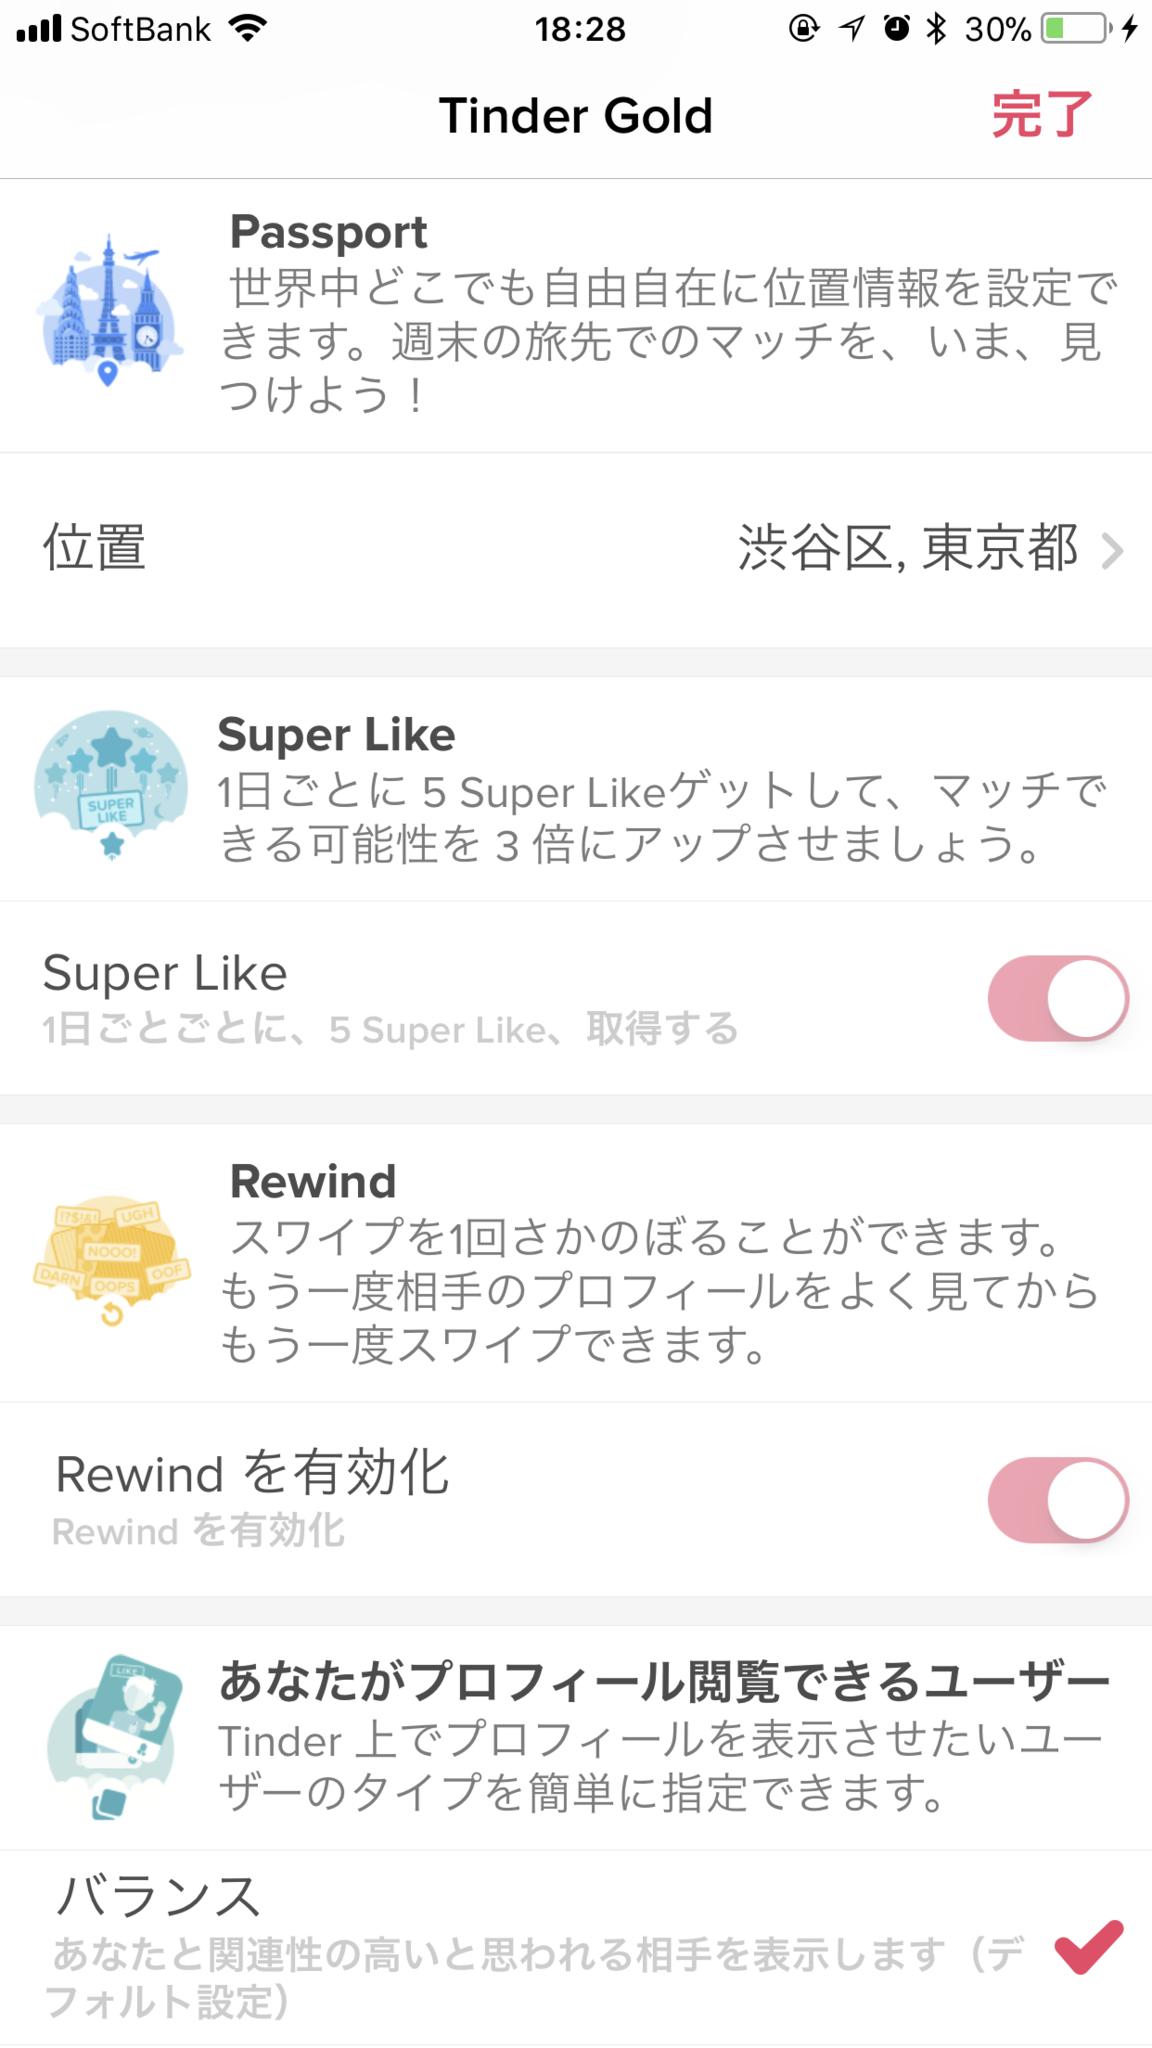 Tinder(ティンダー) Rewind(リワインド)無制限